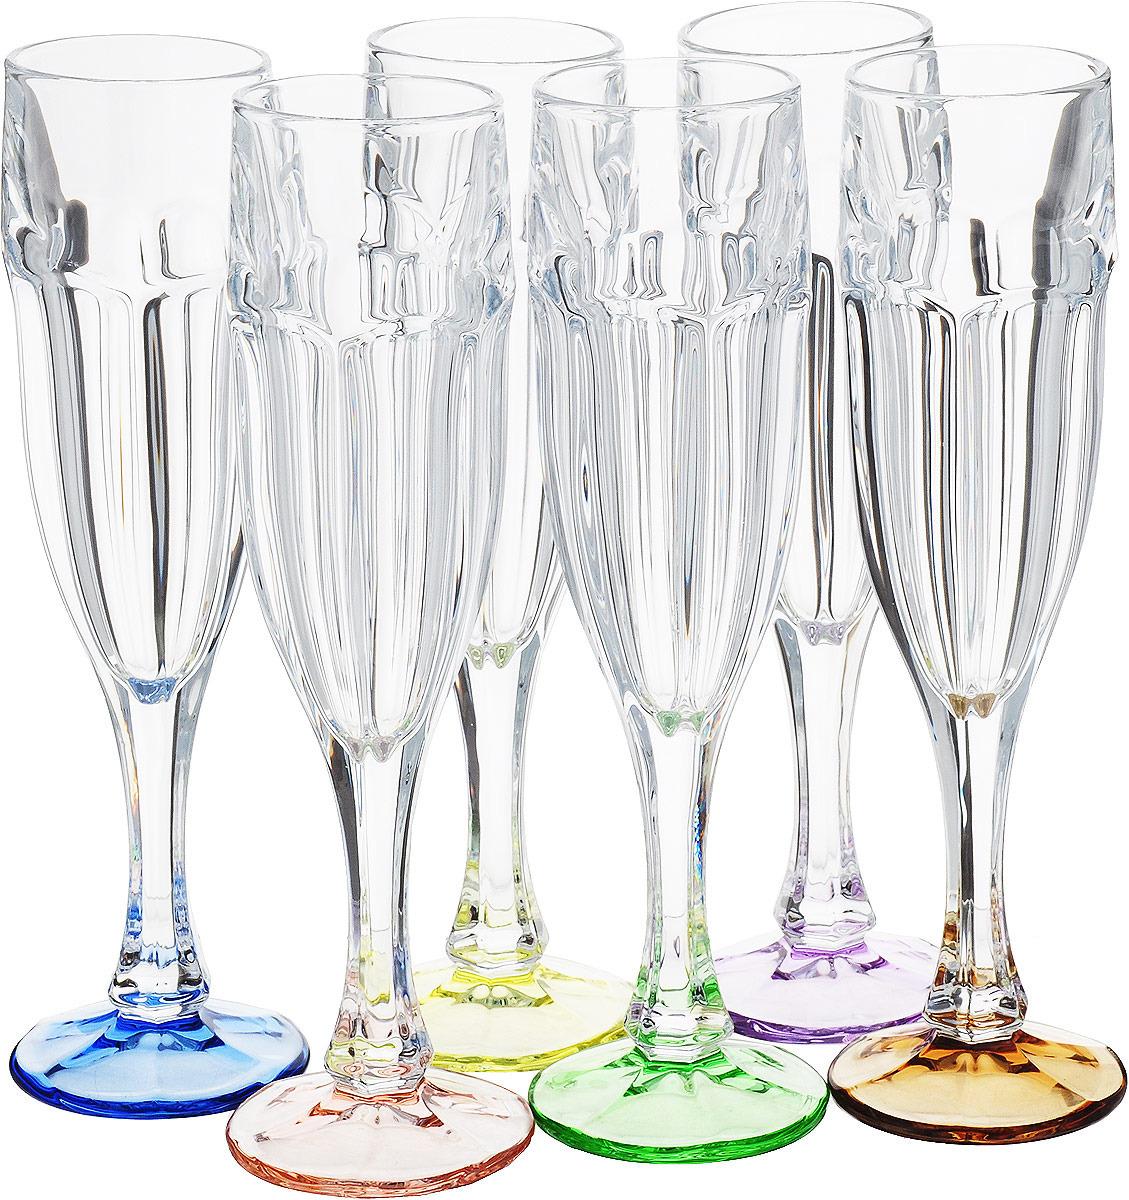 Набор из 6 фужеров для шампанского Crystalite Bohemia Сафари Ассорти, 150 мл